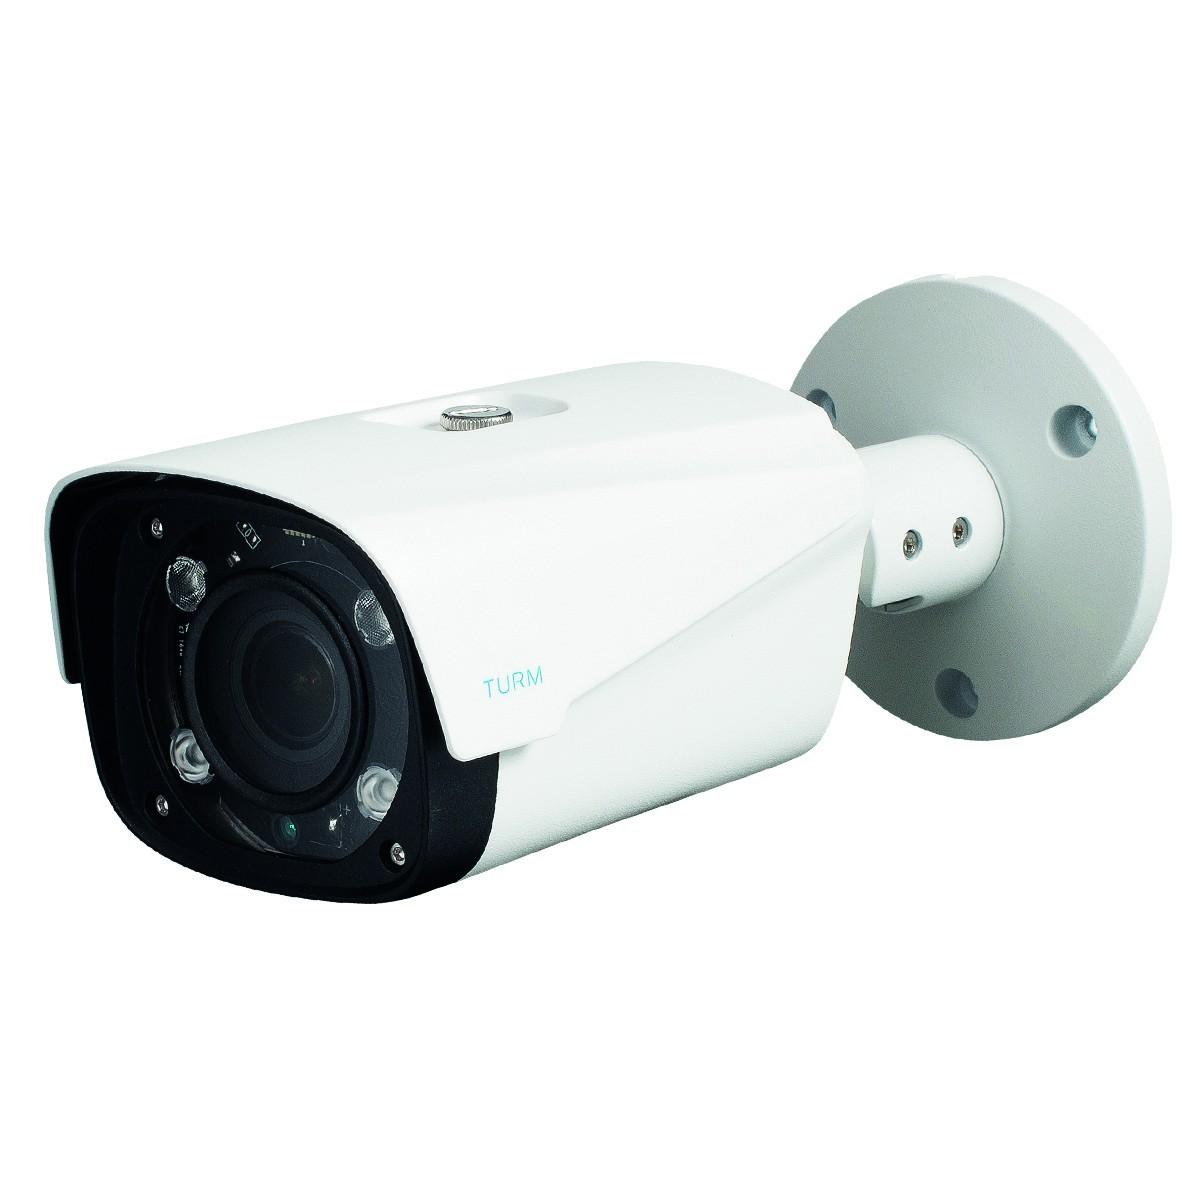 ip netzwerk kamera 4 megapixel 60m ip43 1 - Secura Baucam